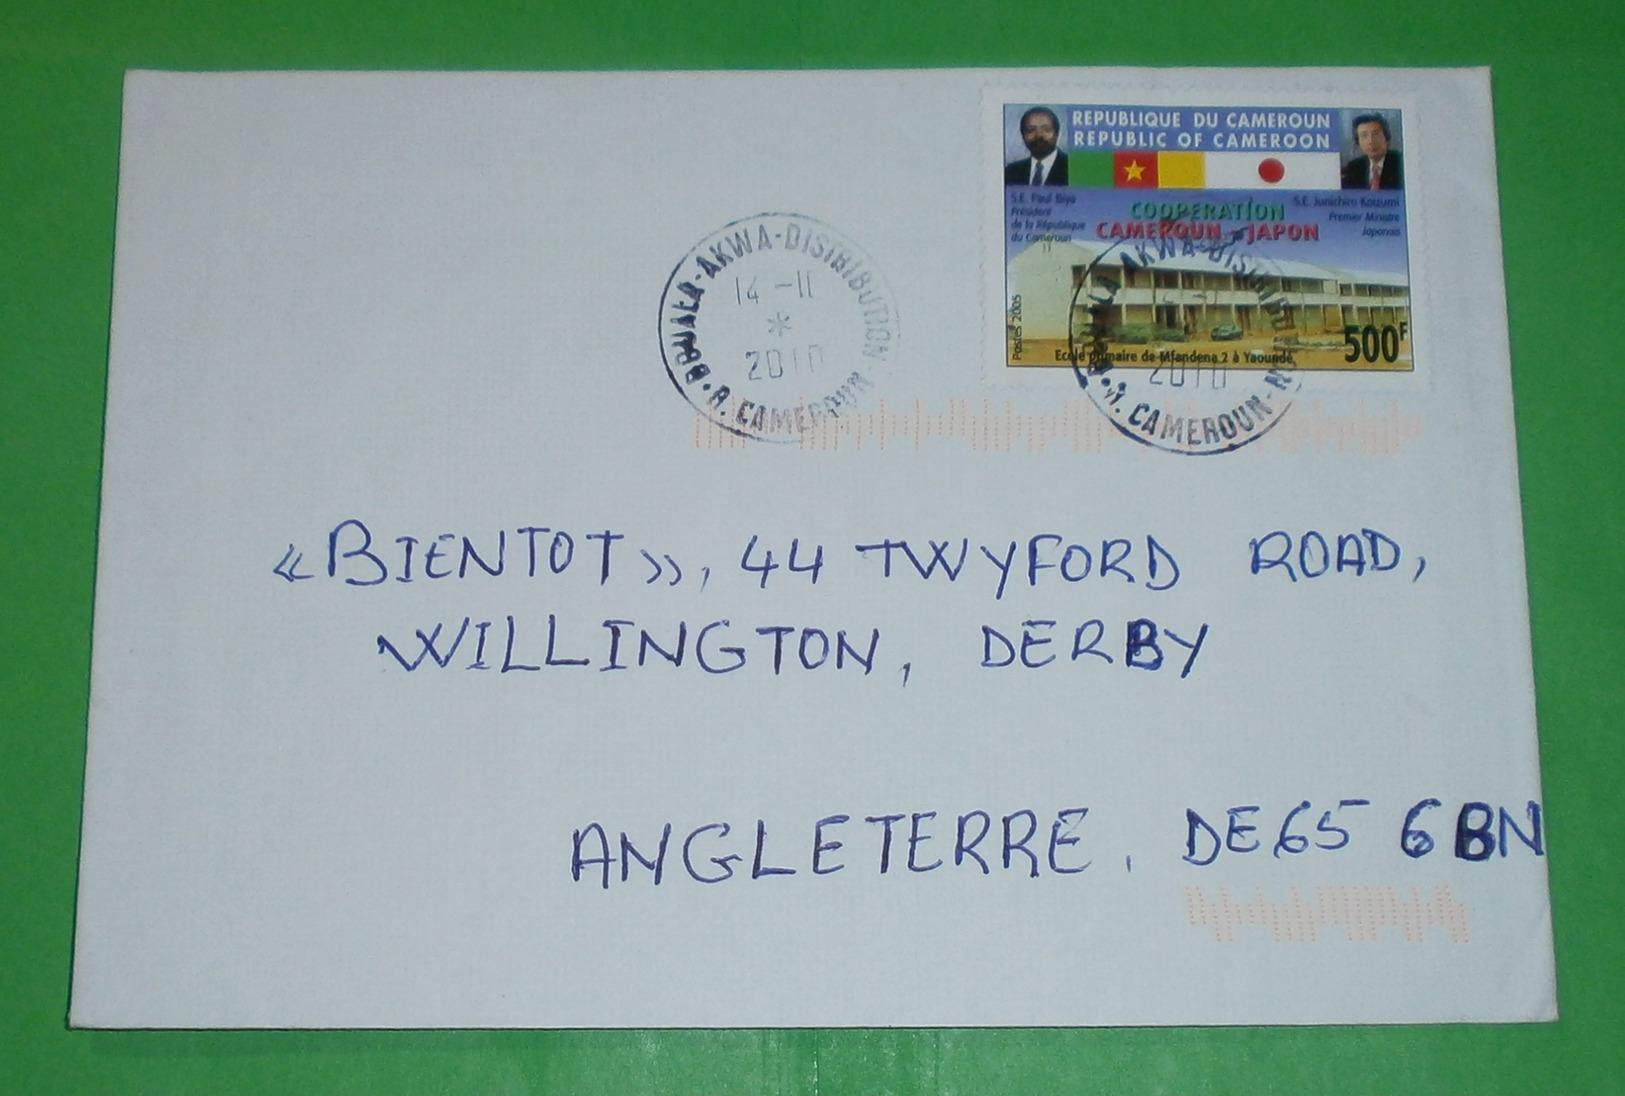 KAMERUN - Brief Letter Lettre 信 Lettera Carta письмо Brev 手紙 จดหมาย Cover Envelope (2 Foto)(x034411) - Camerun (1960-...)